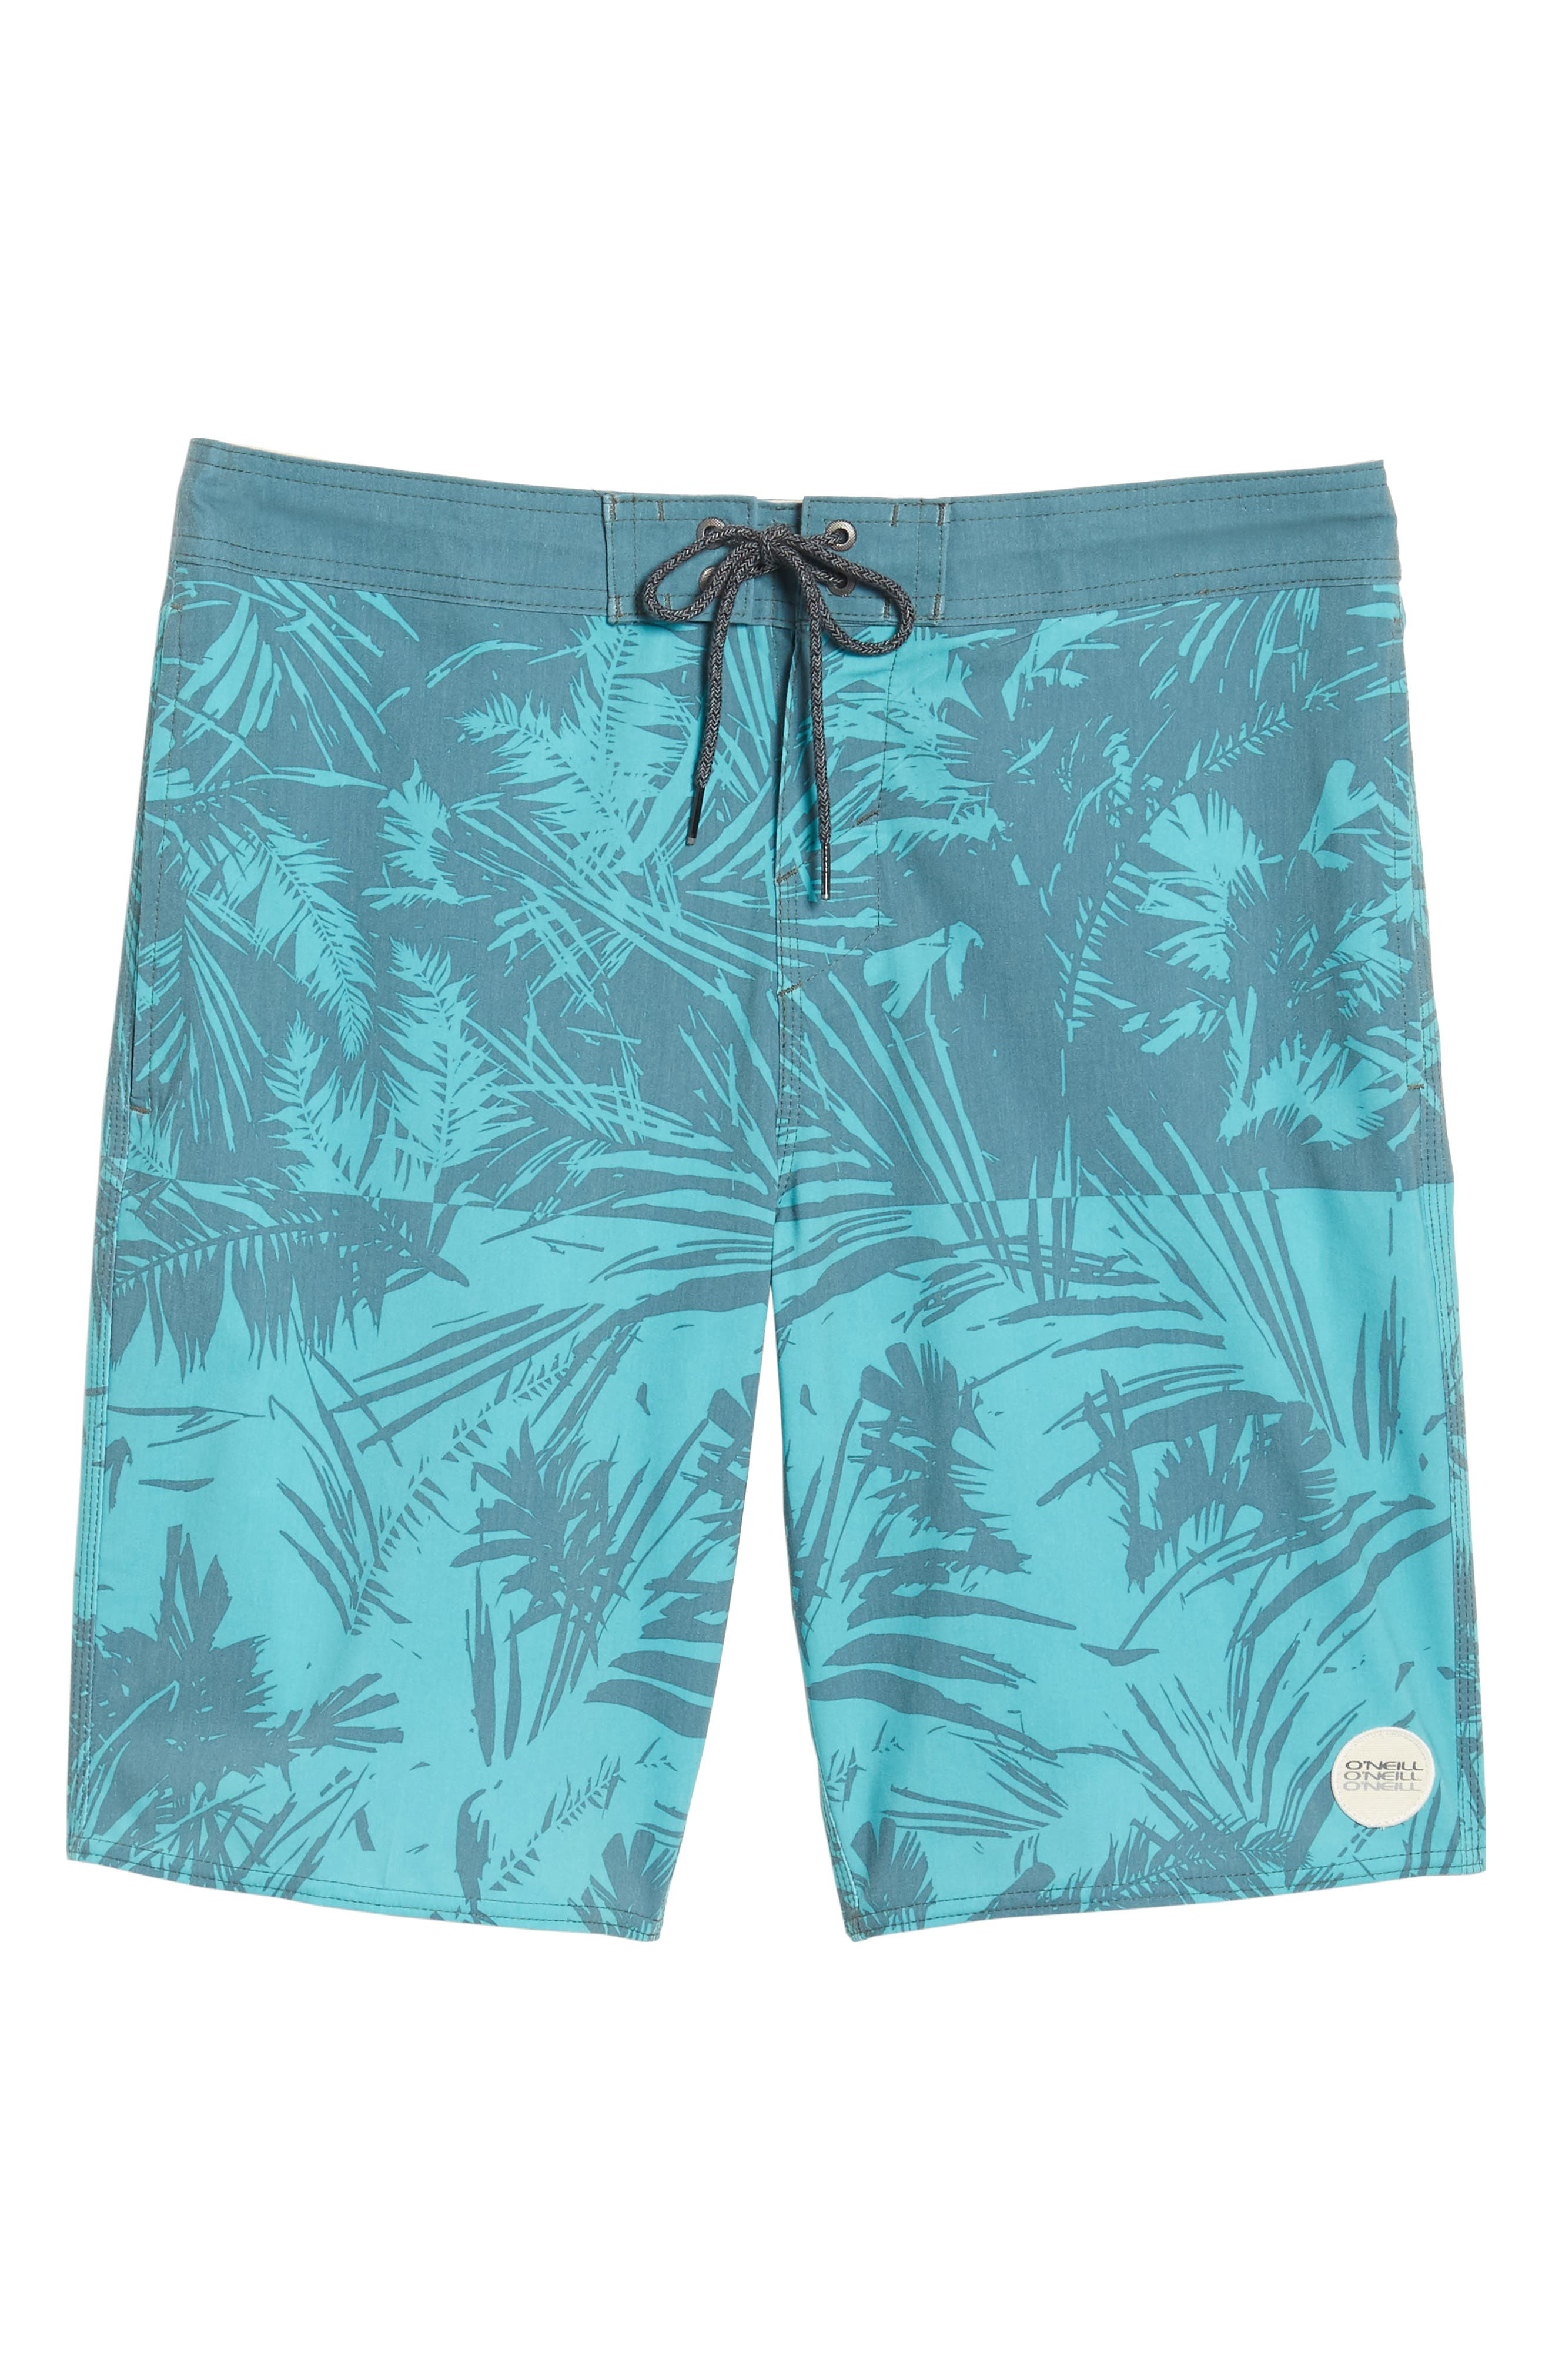 Inverted Cruzer Board Shorts,                             Alternate thumbnail 6, color,                             440